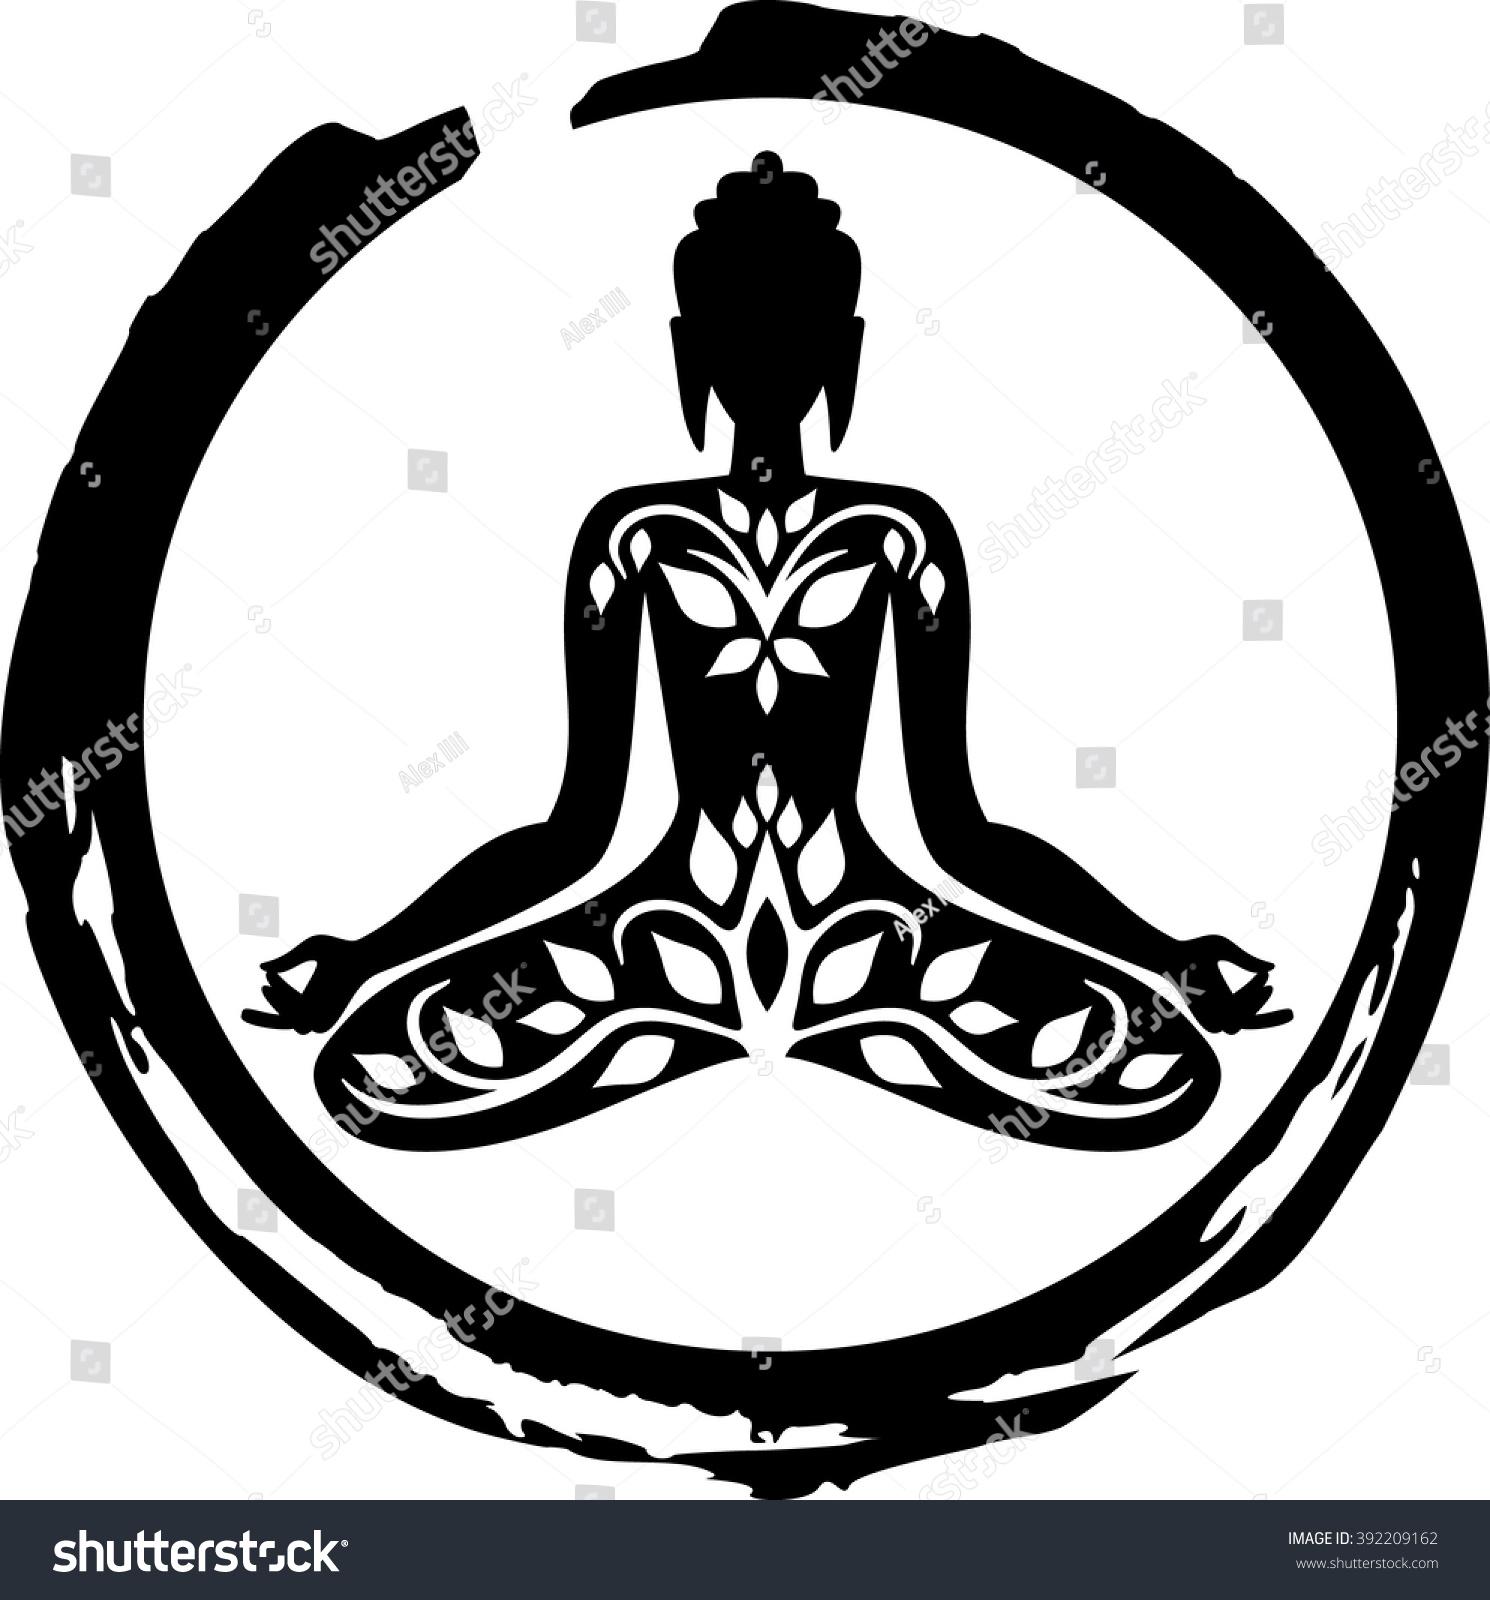 Buddha symbol stock vector 392209162 shutterstock buddha symbol biocorpaavc